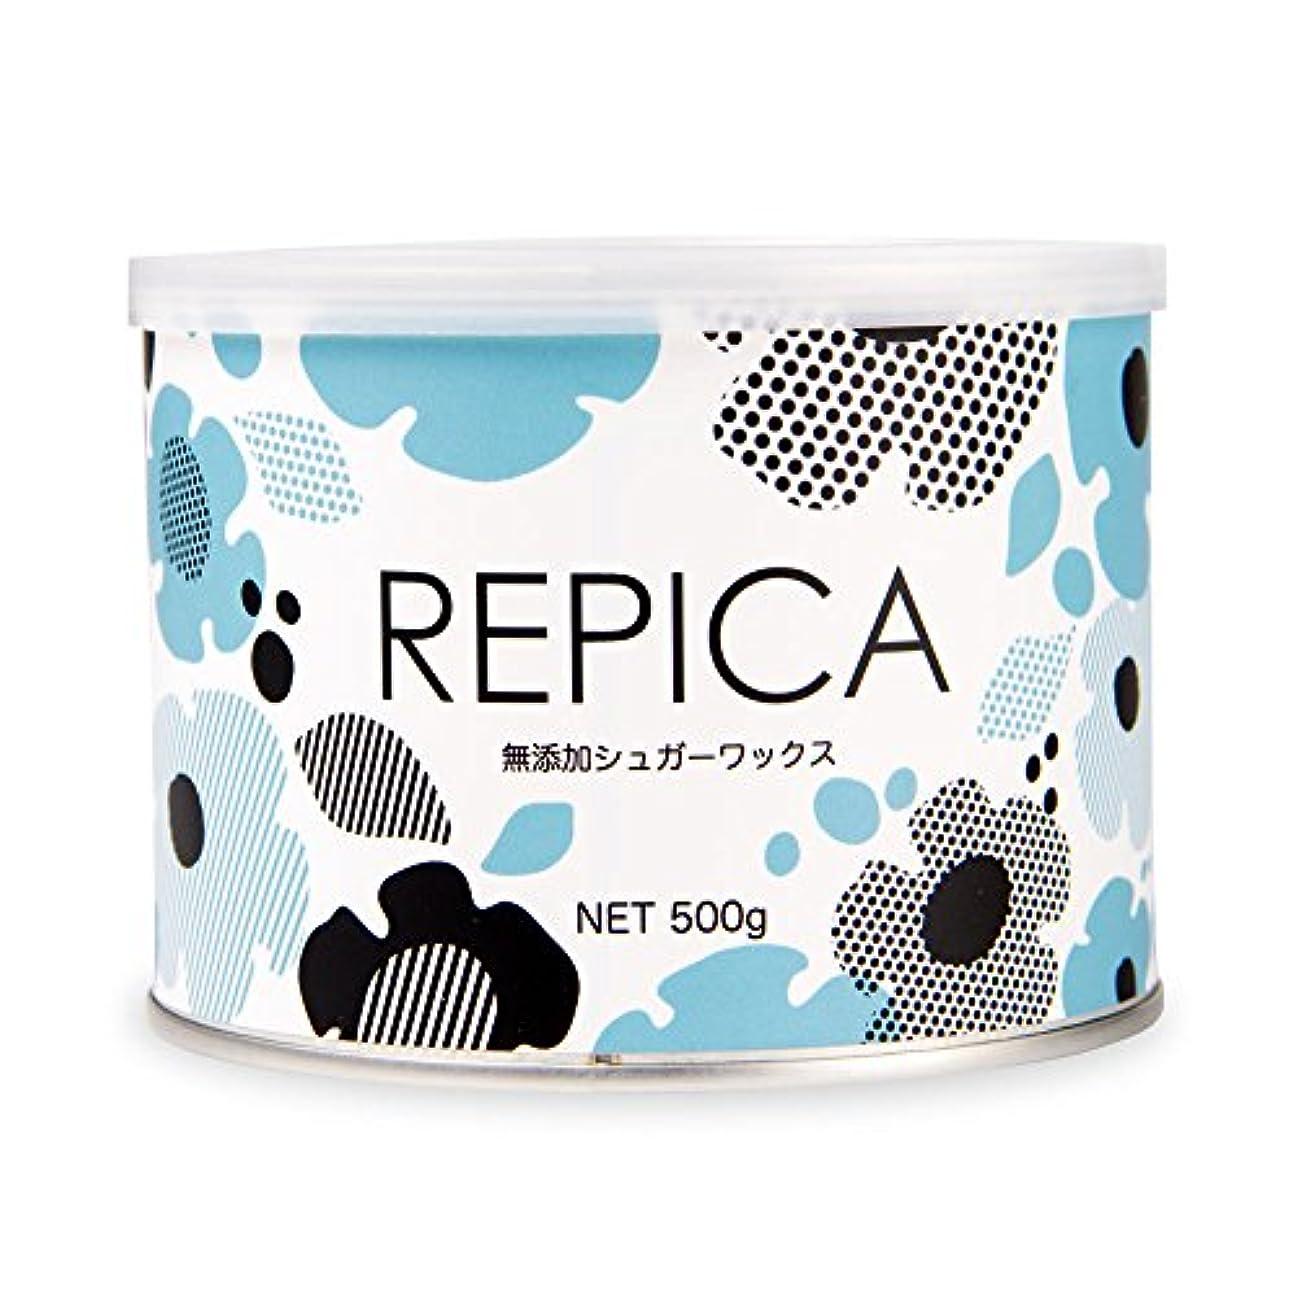 REPICA 無添加シュガーワックス 400ml ブラジリアンワックス脱毛 24個